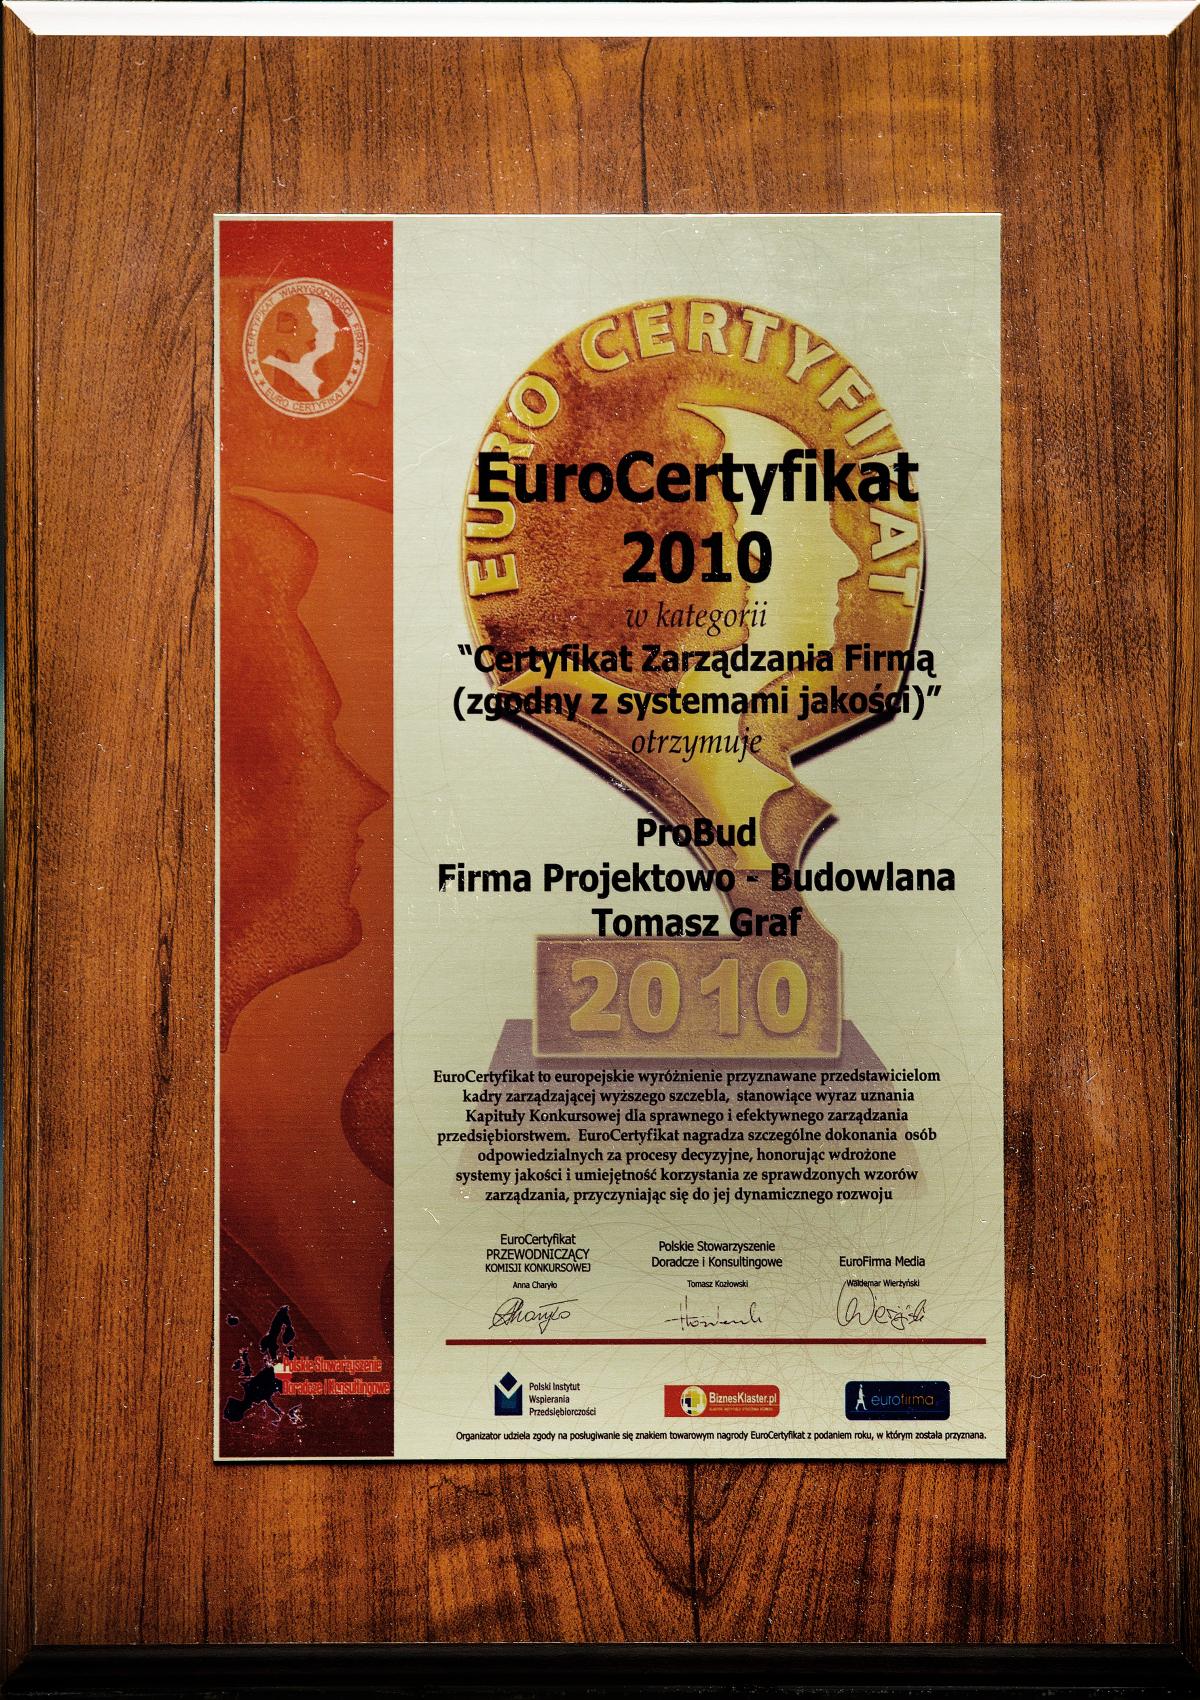 EURO Certyfikat 2010